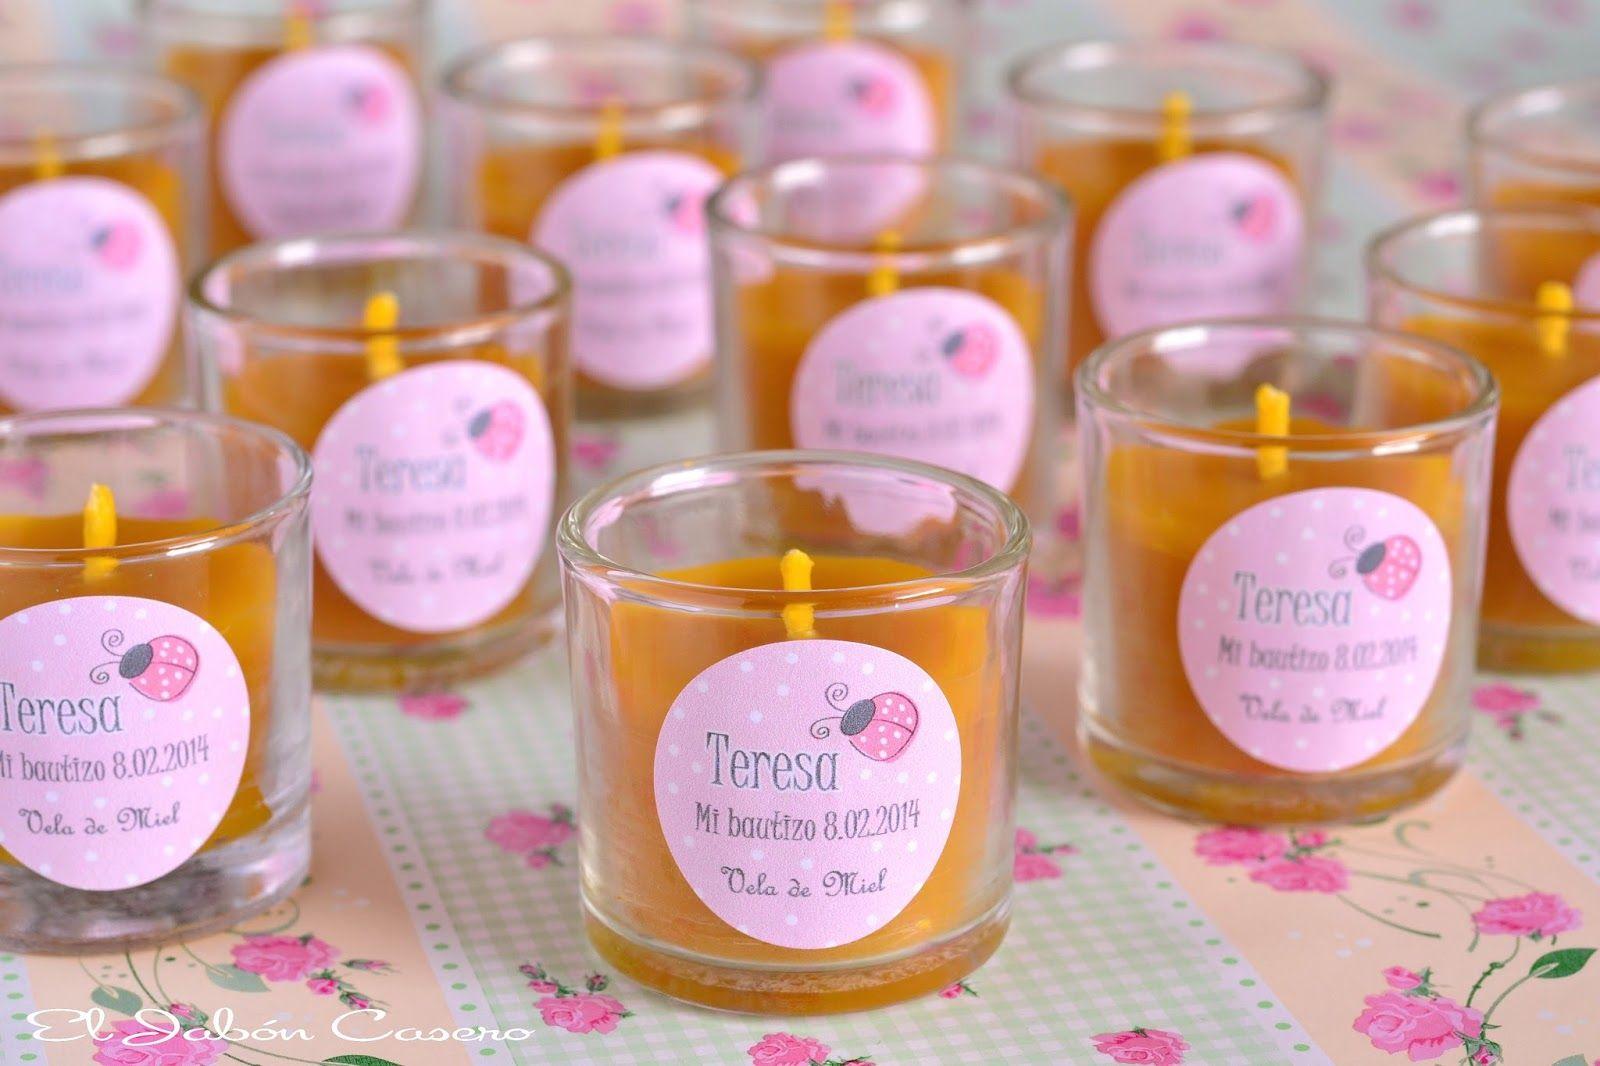 Velas de miel personalizadas detalles de bautizos bautizo o baptisms pinterest - Velas de miel ...